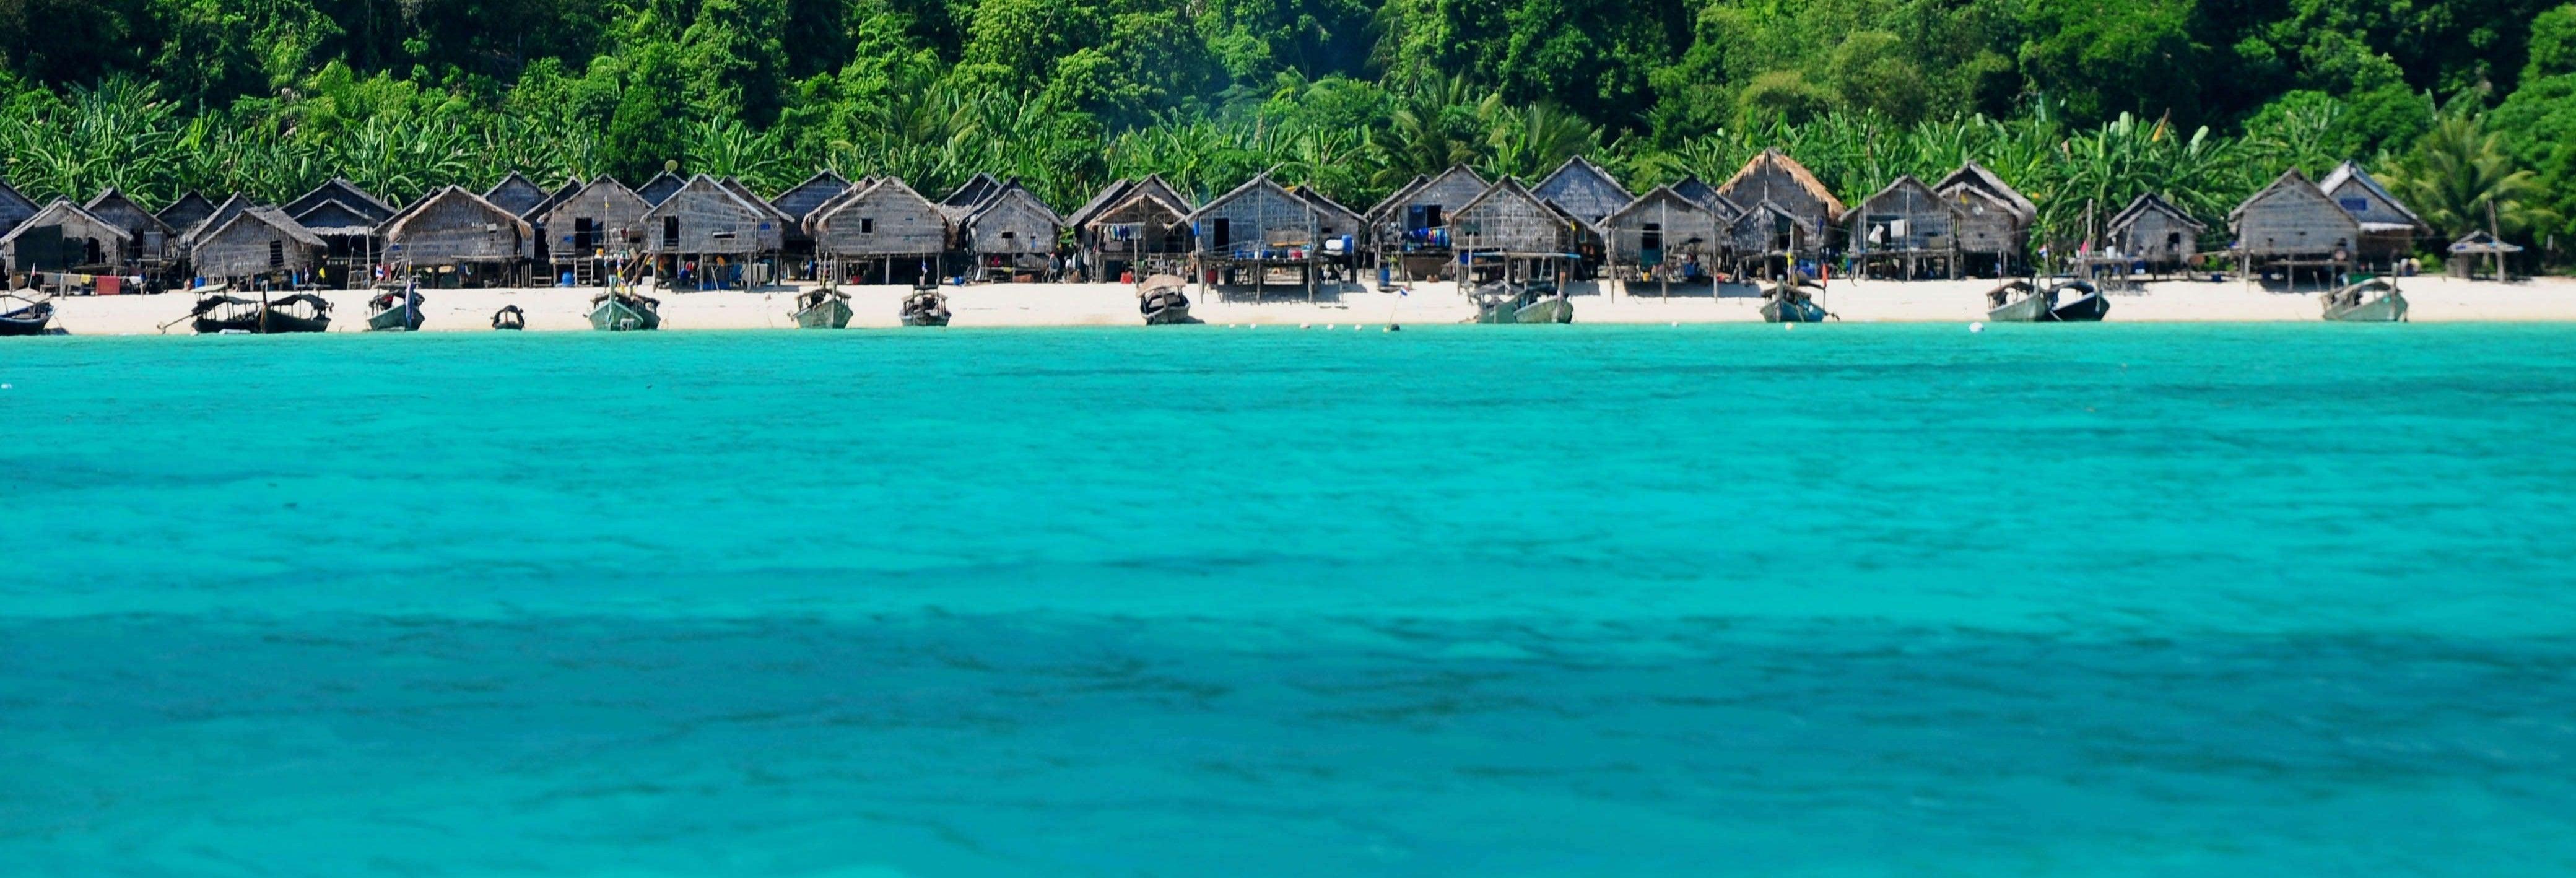 Excursão às ilhas Surin de lancha